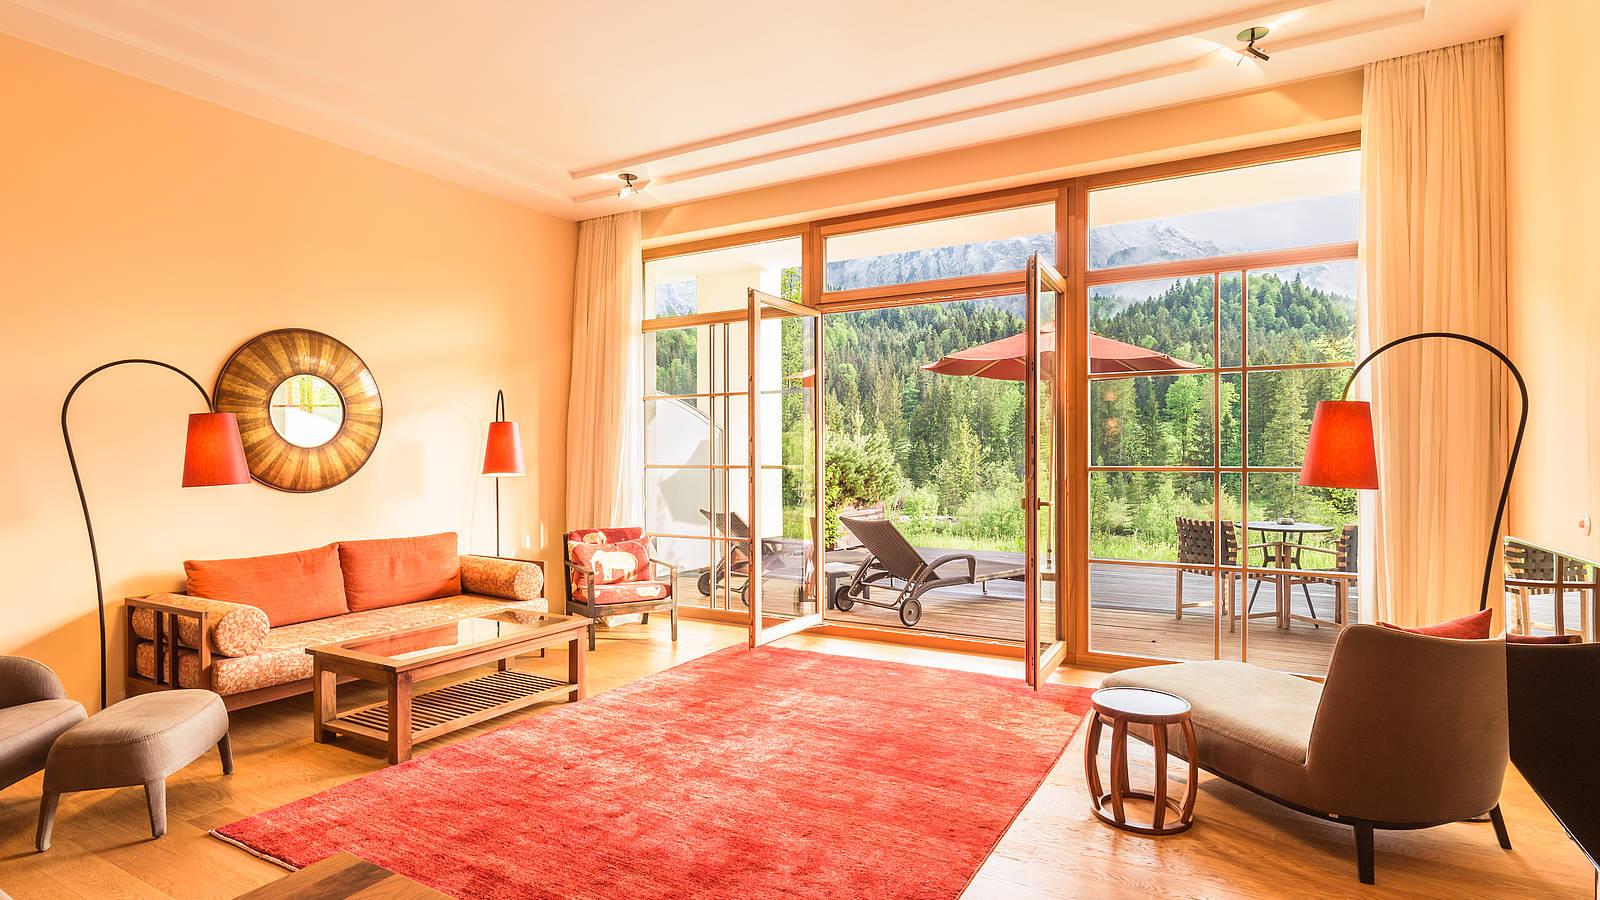 5 sterne wellness hotel bayern schloss elmau for Warnemunde 5 sterne hotel